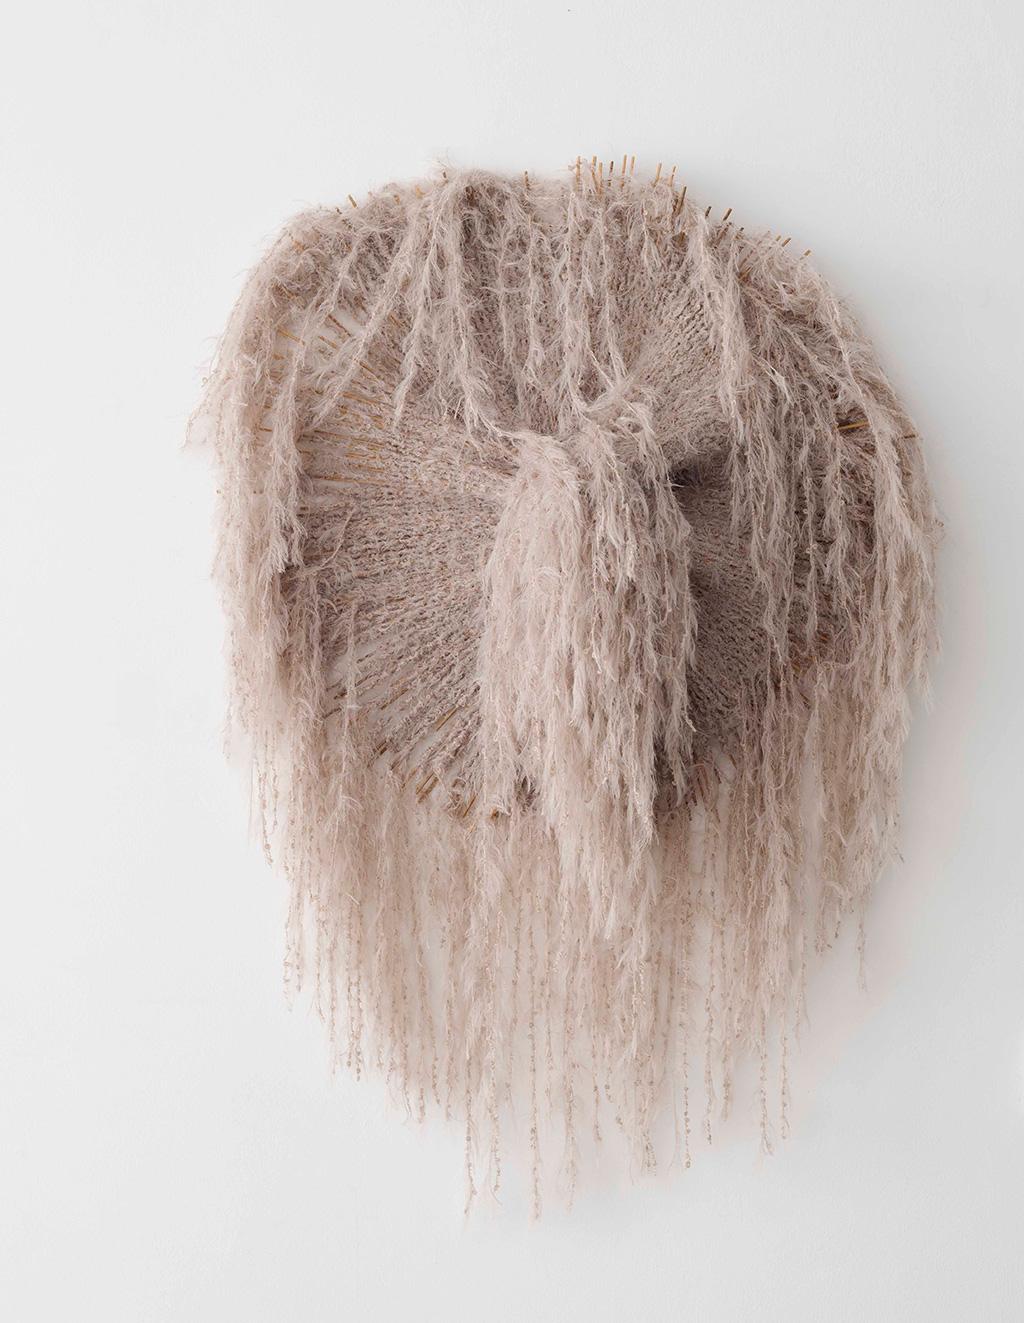 Oyster,-Bamboo,-fibre,-70x90x10cm-$6800